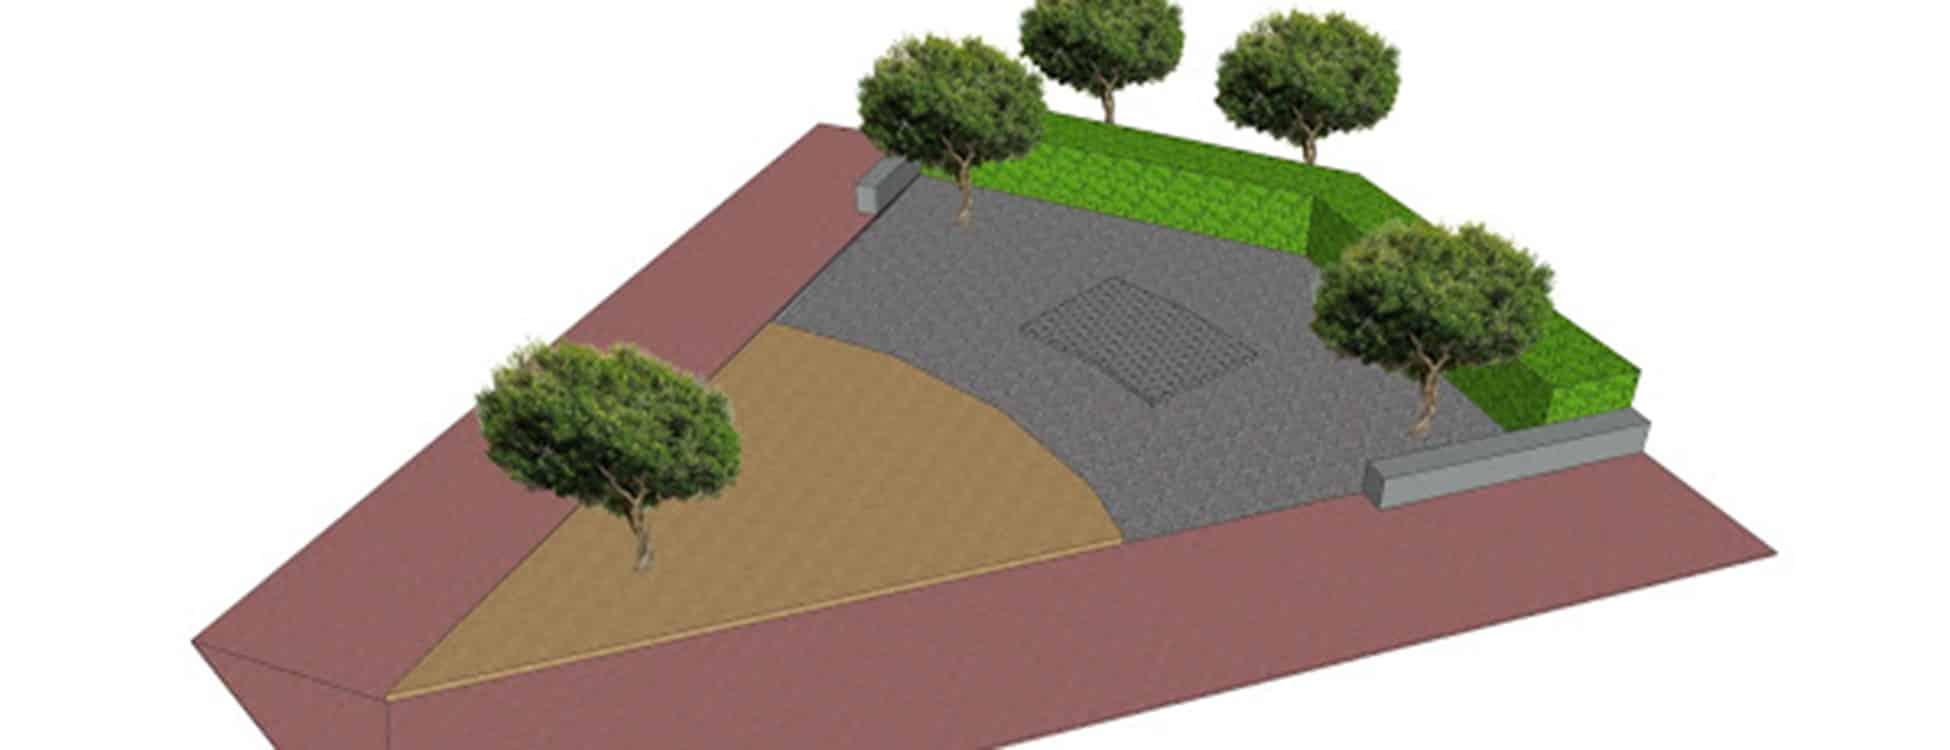 landscape design, plan, Randolph Center campus